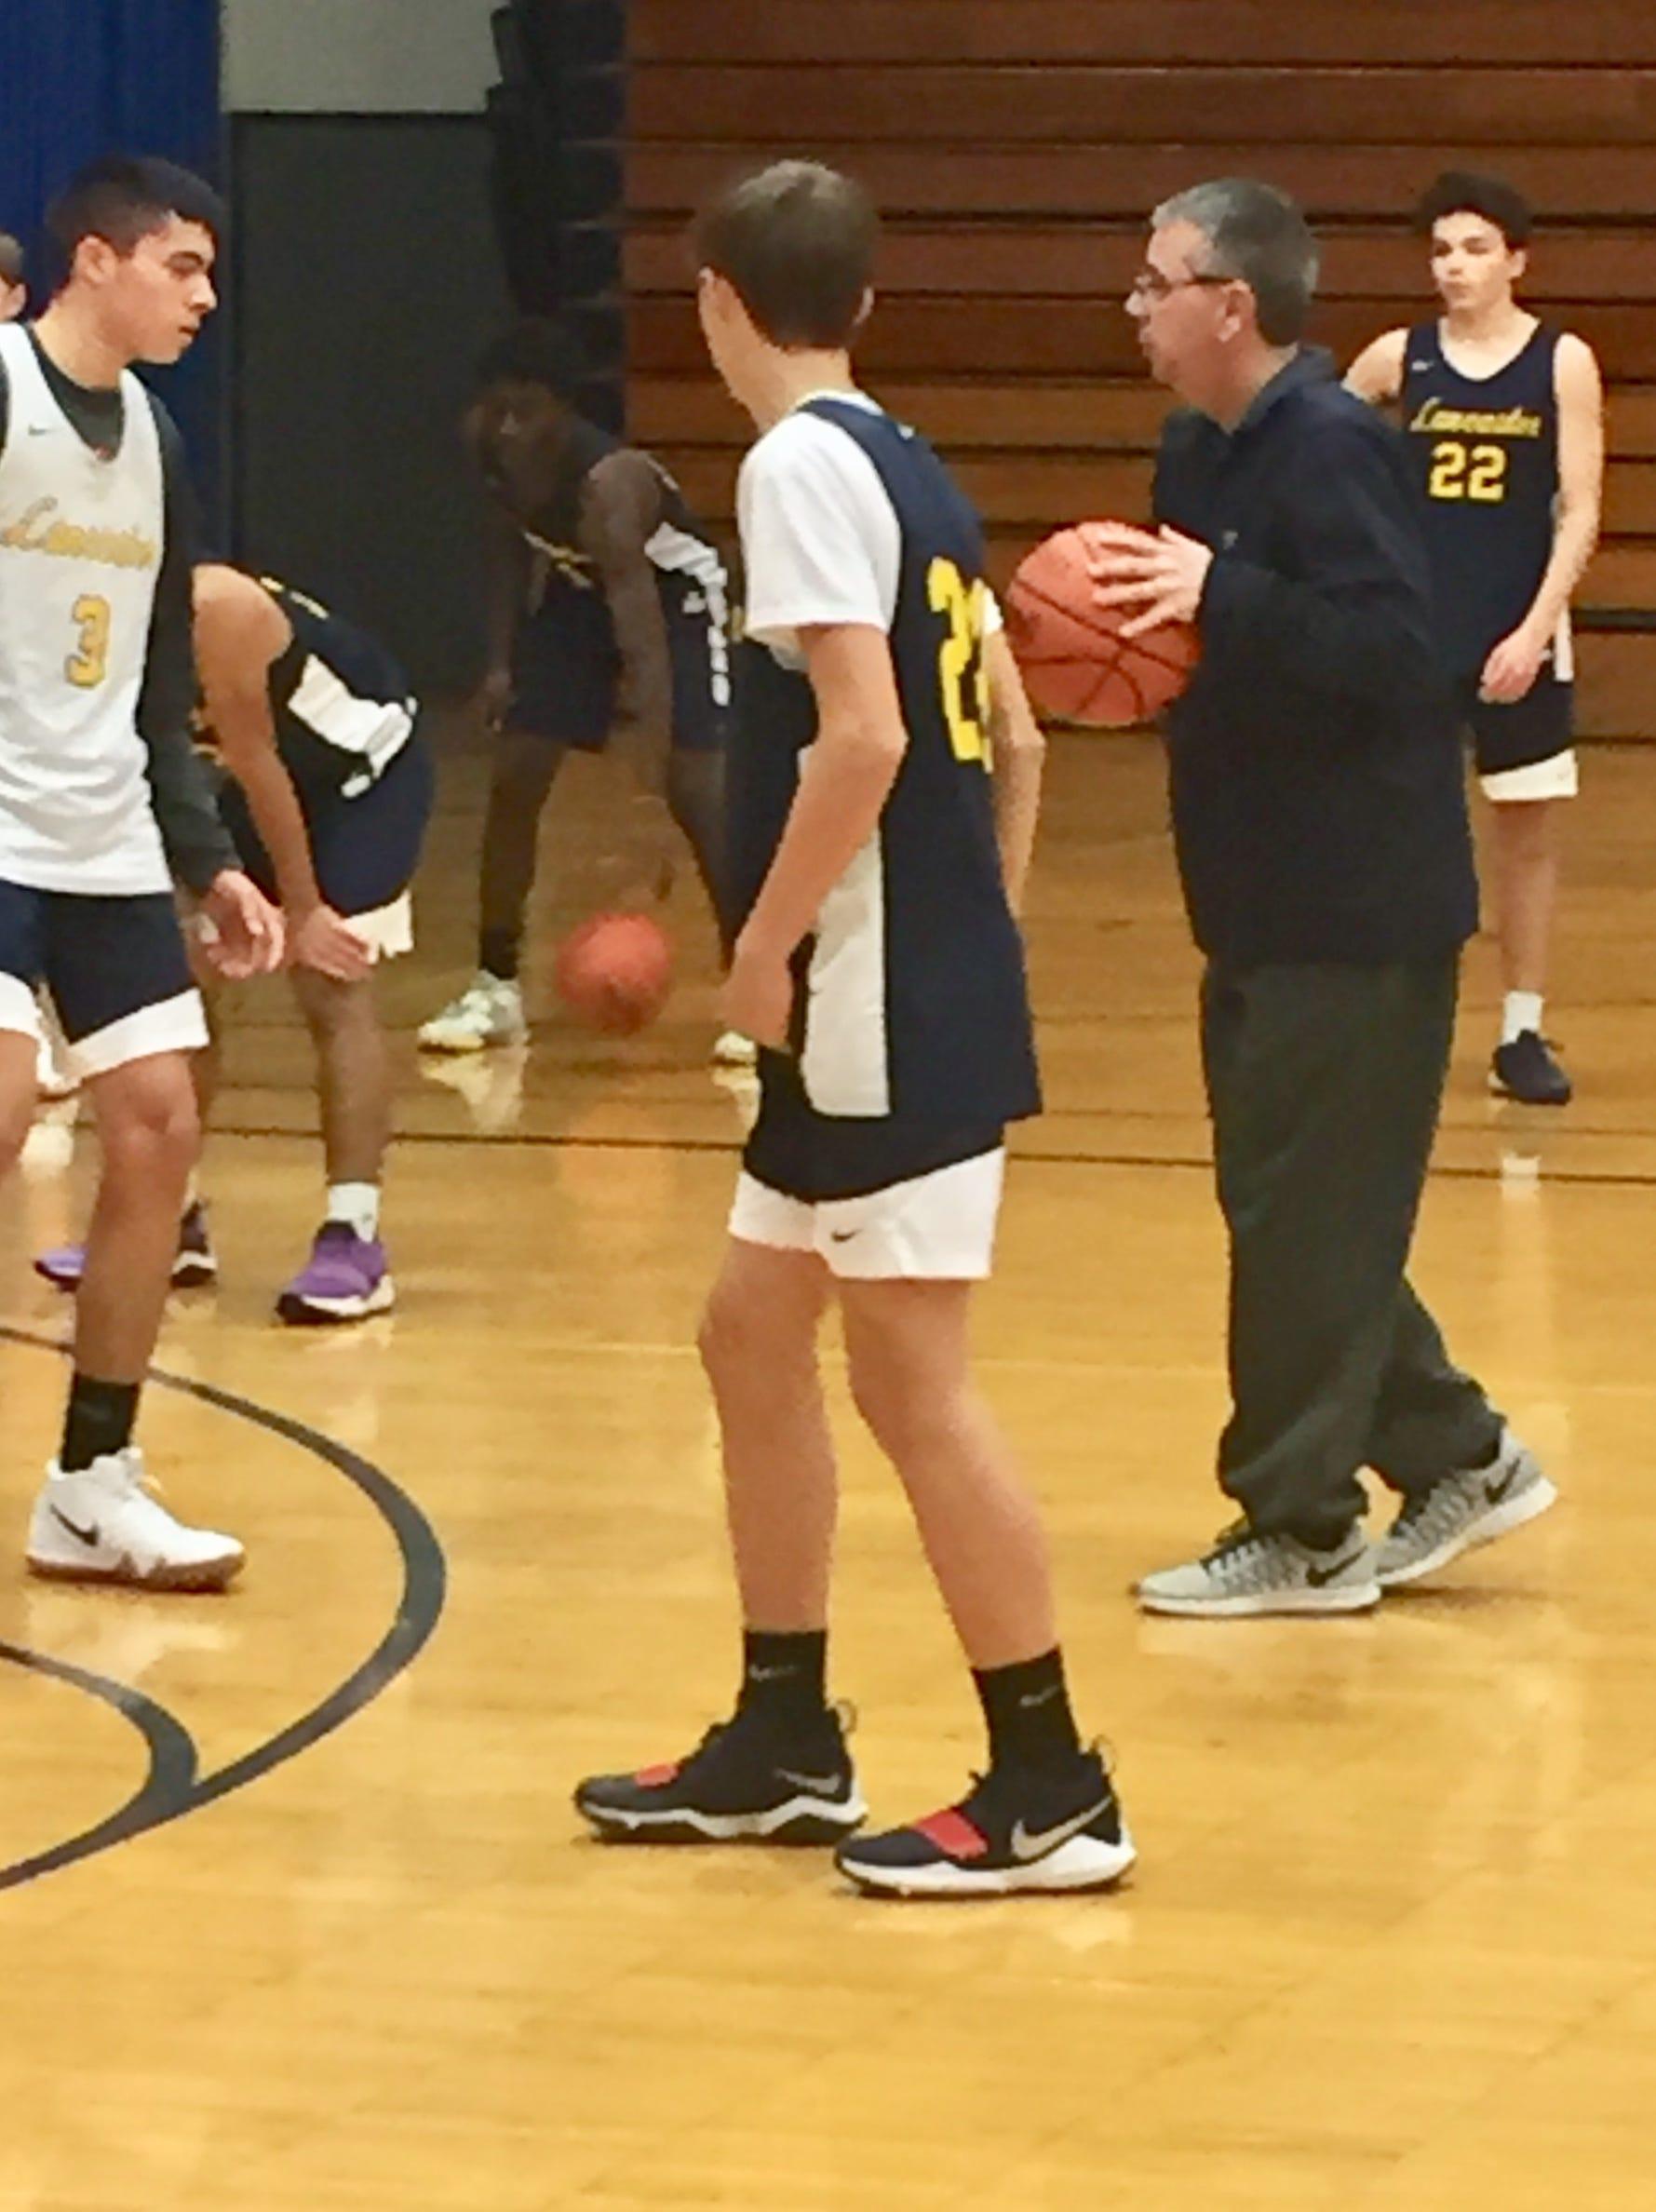 Coach Riggs